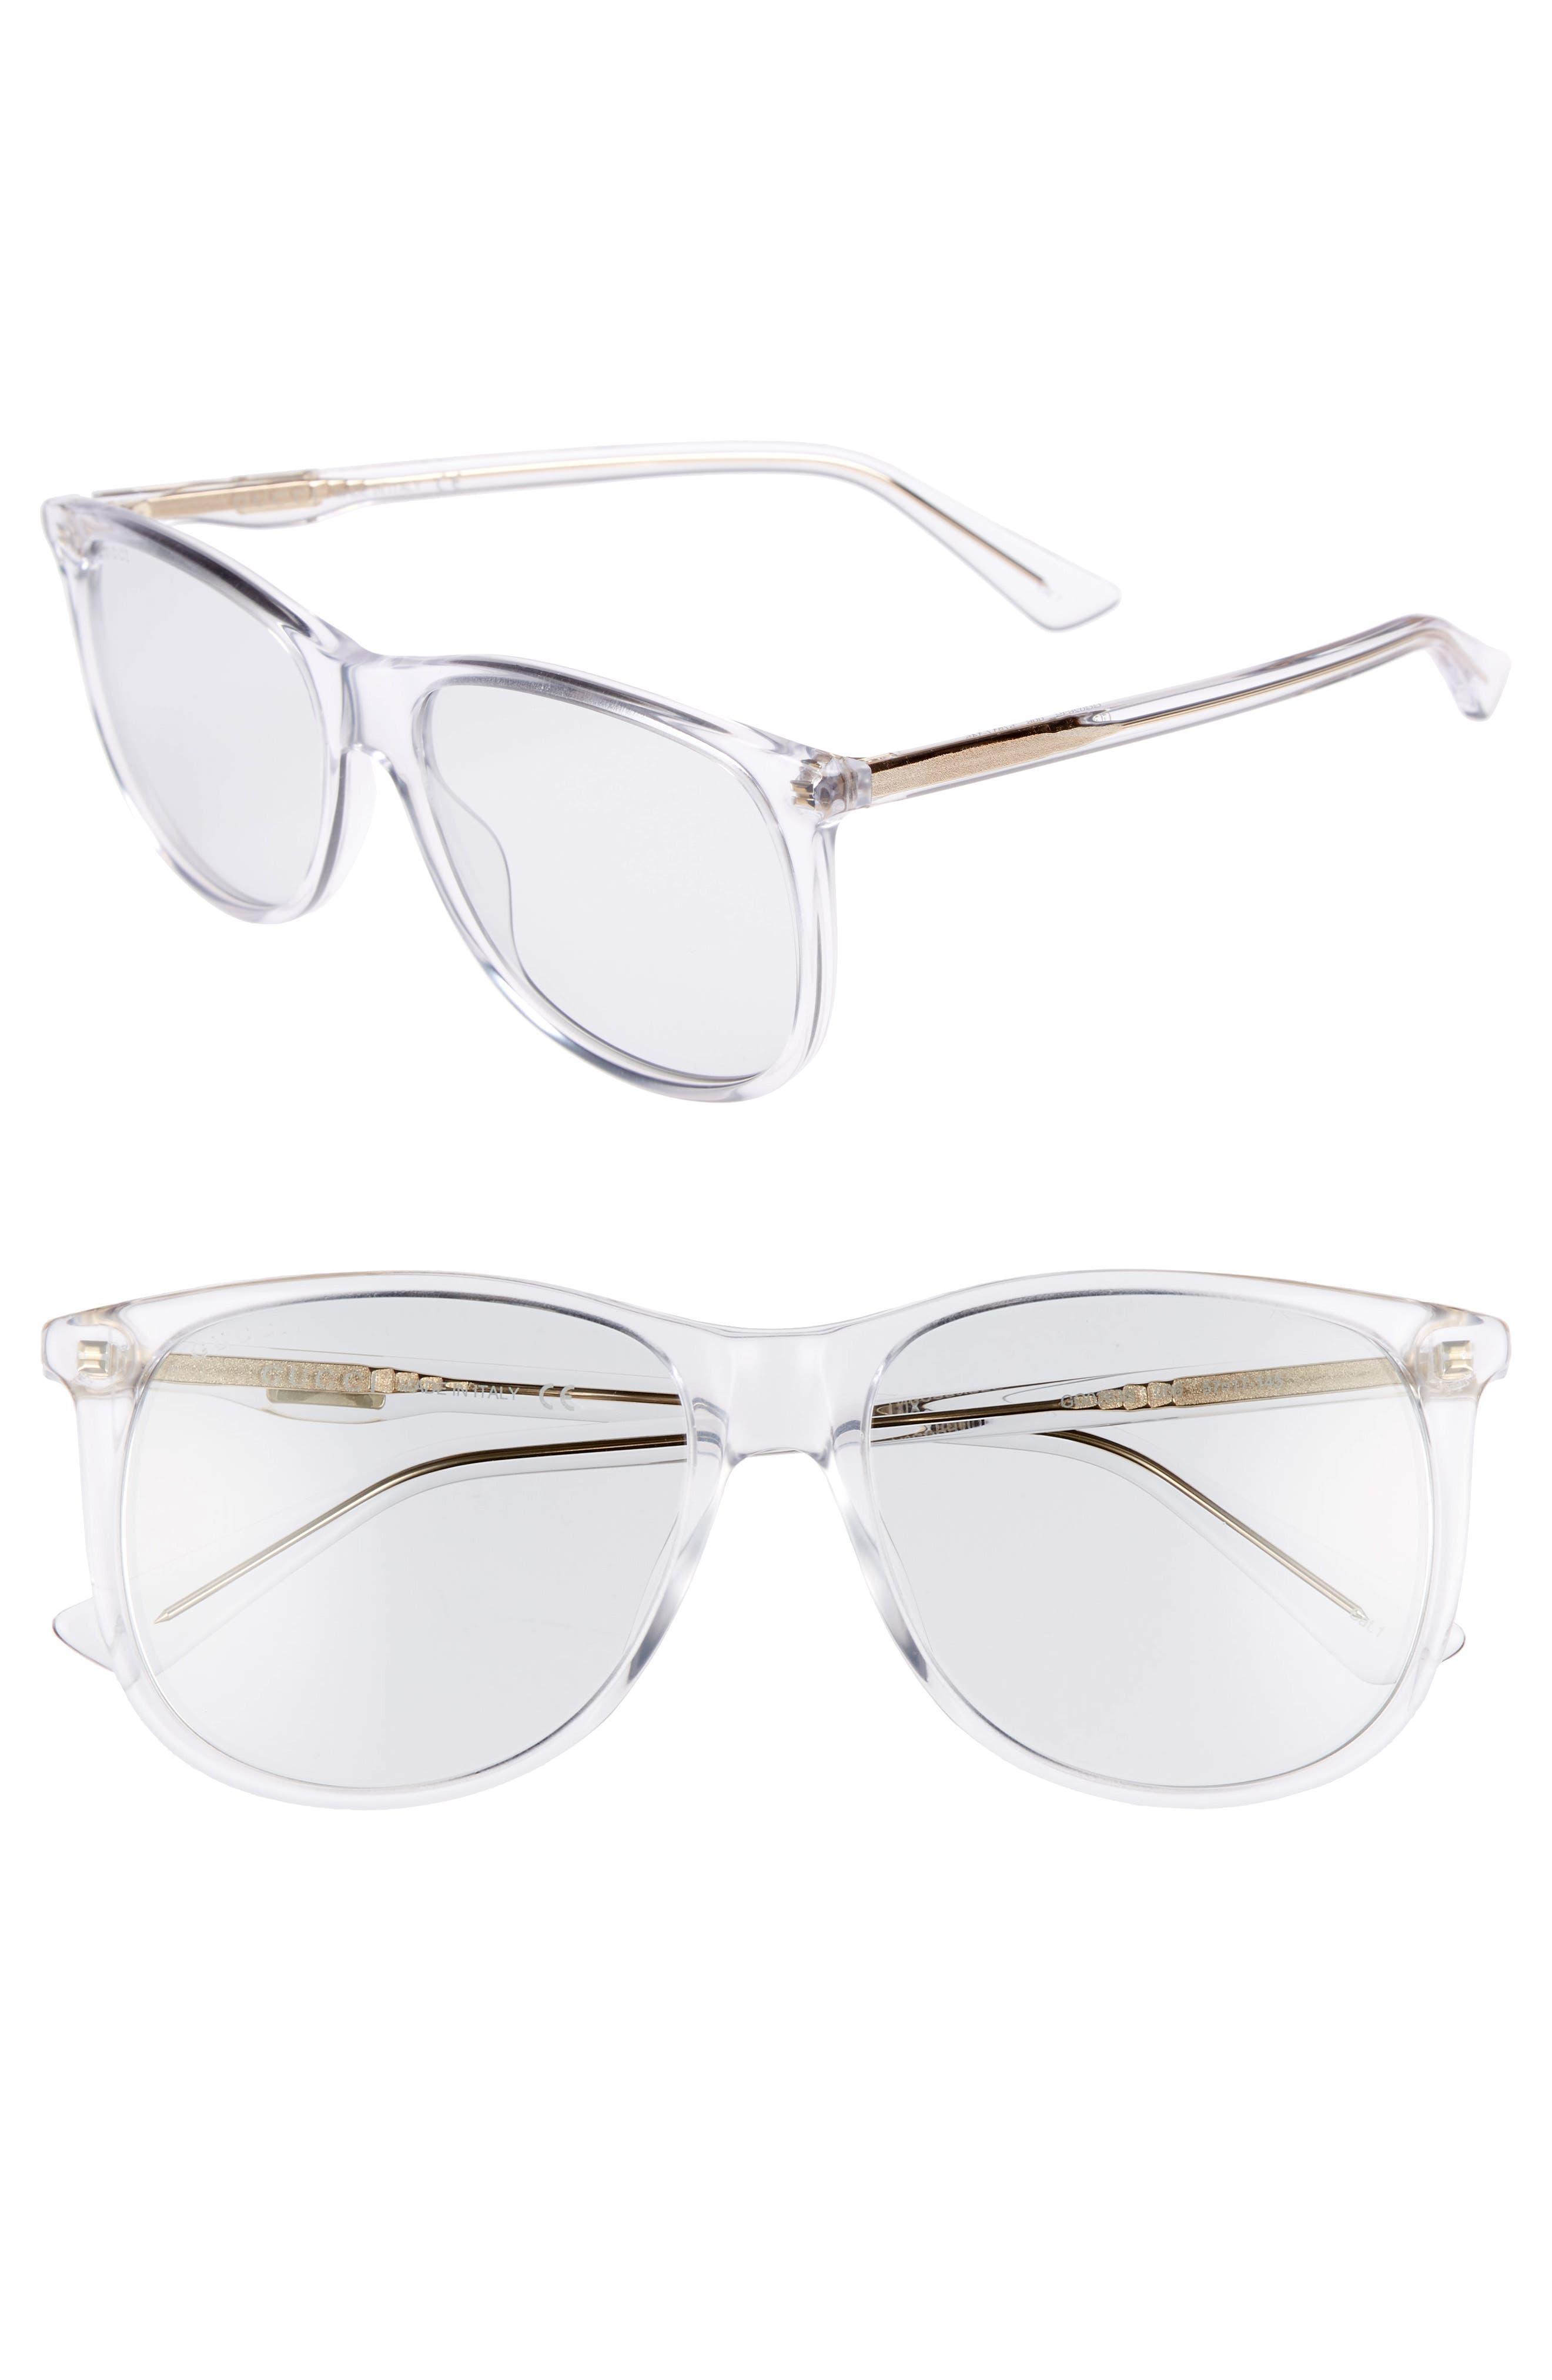 80s 56mm Sunglasses,                             Main thumbnail 1, color,                             Crystal